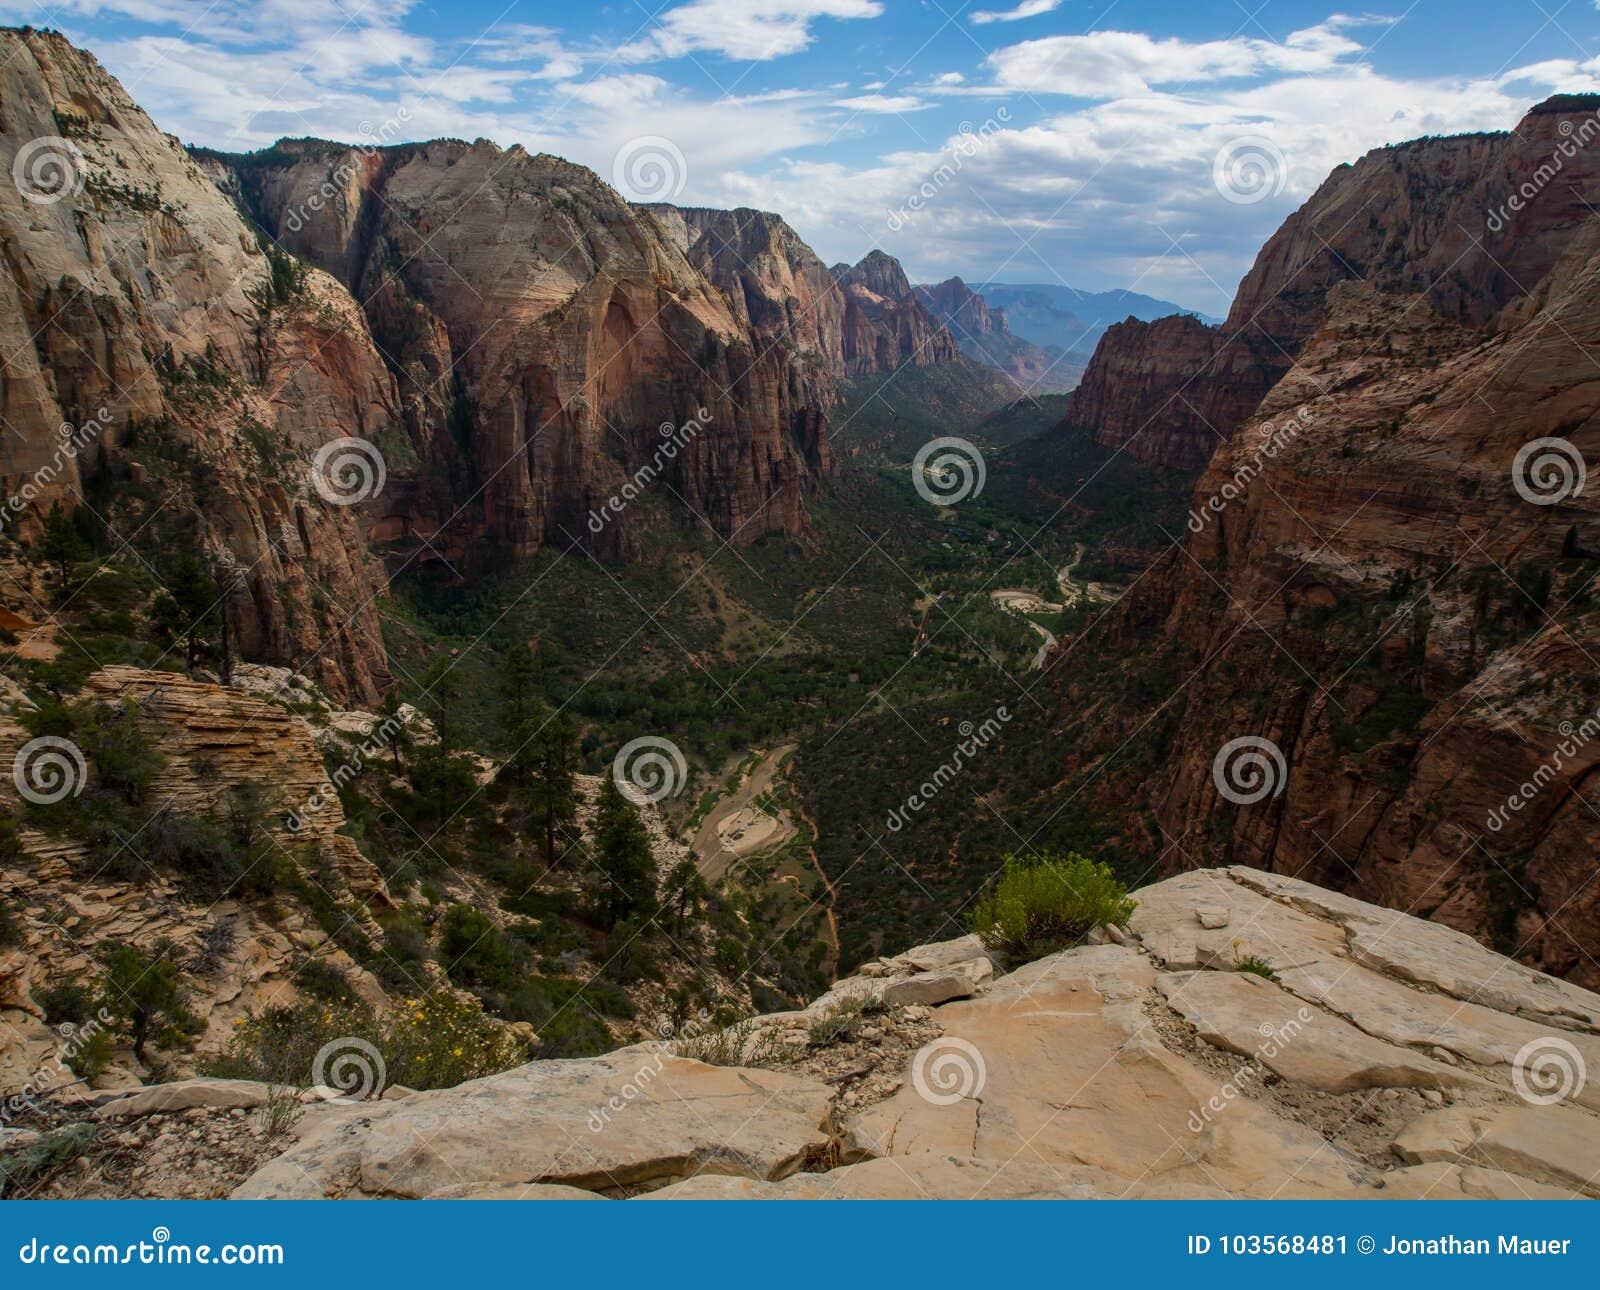 De engelen die overzien Canionmening, Zion National Park, Utah landen